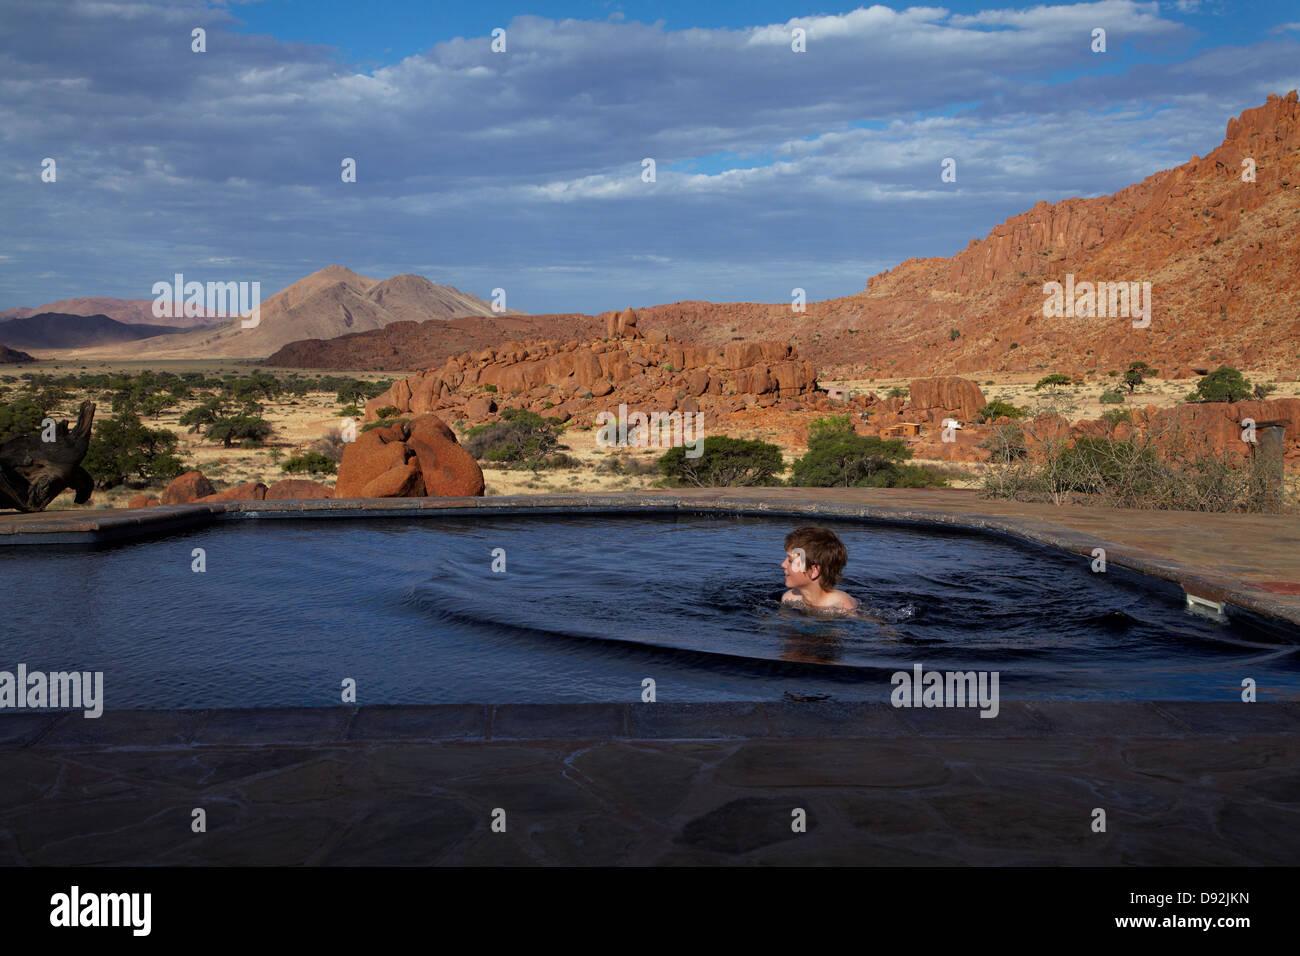 Swimming pool, Fest Inn Fels Farm Lodge, Ranch Koiimasis, Tiras Mountains, Southern Namibia, Africa - Stock Image